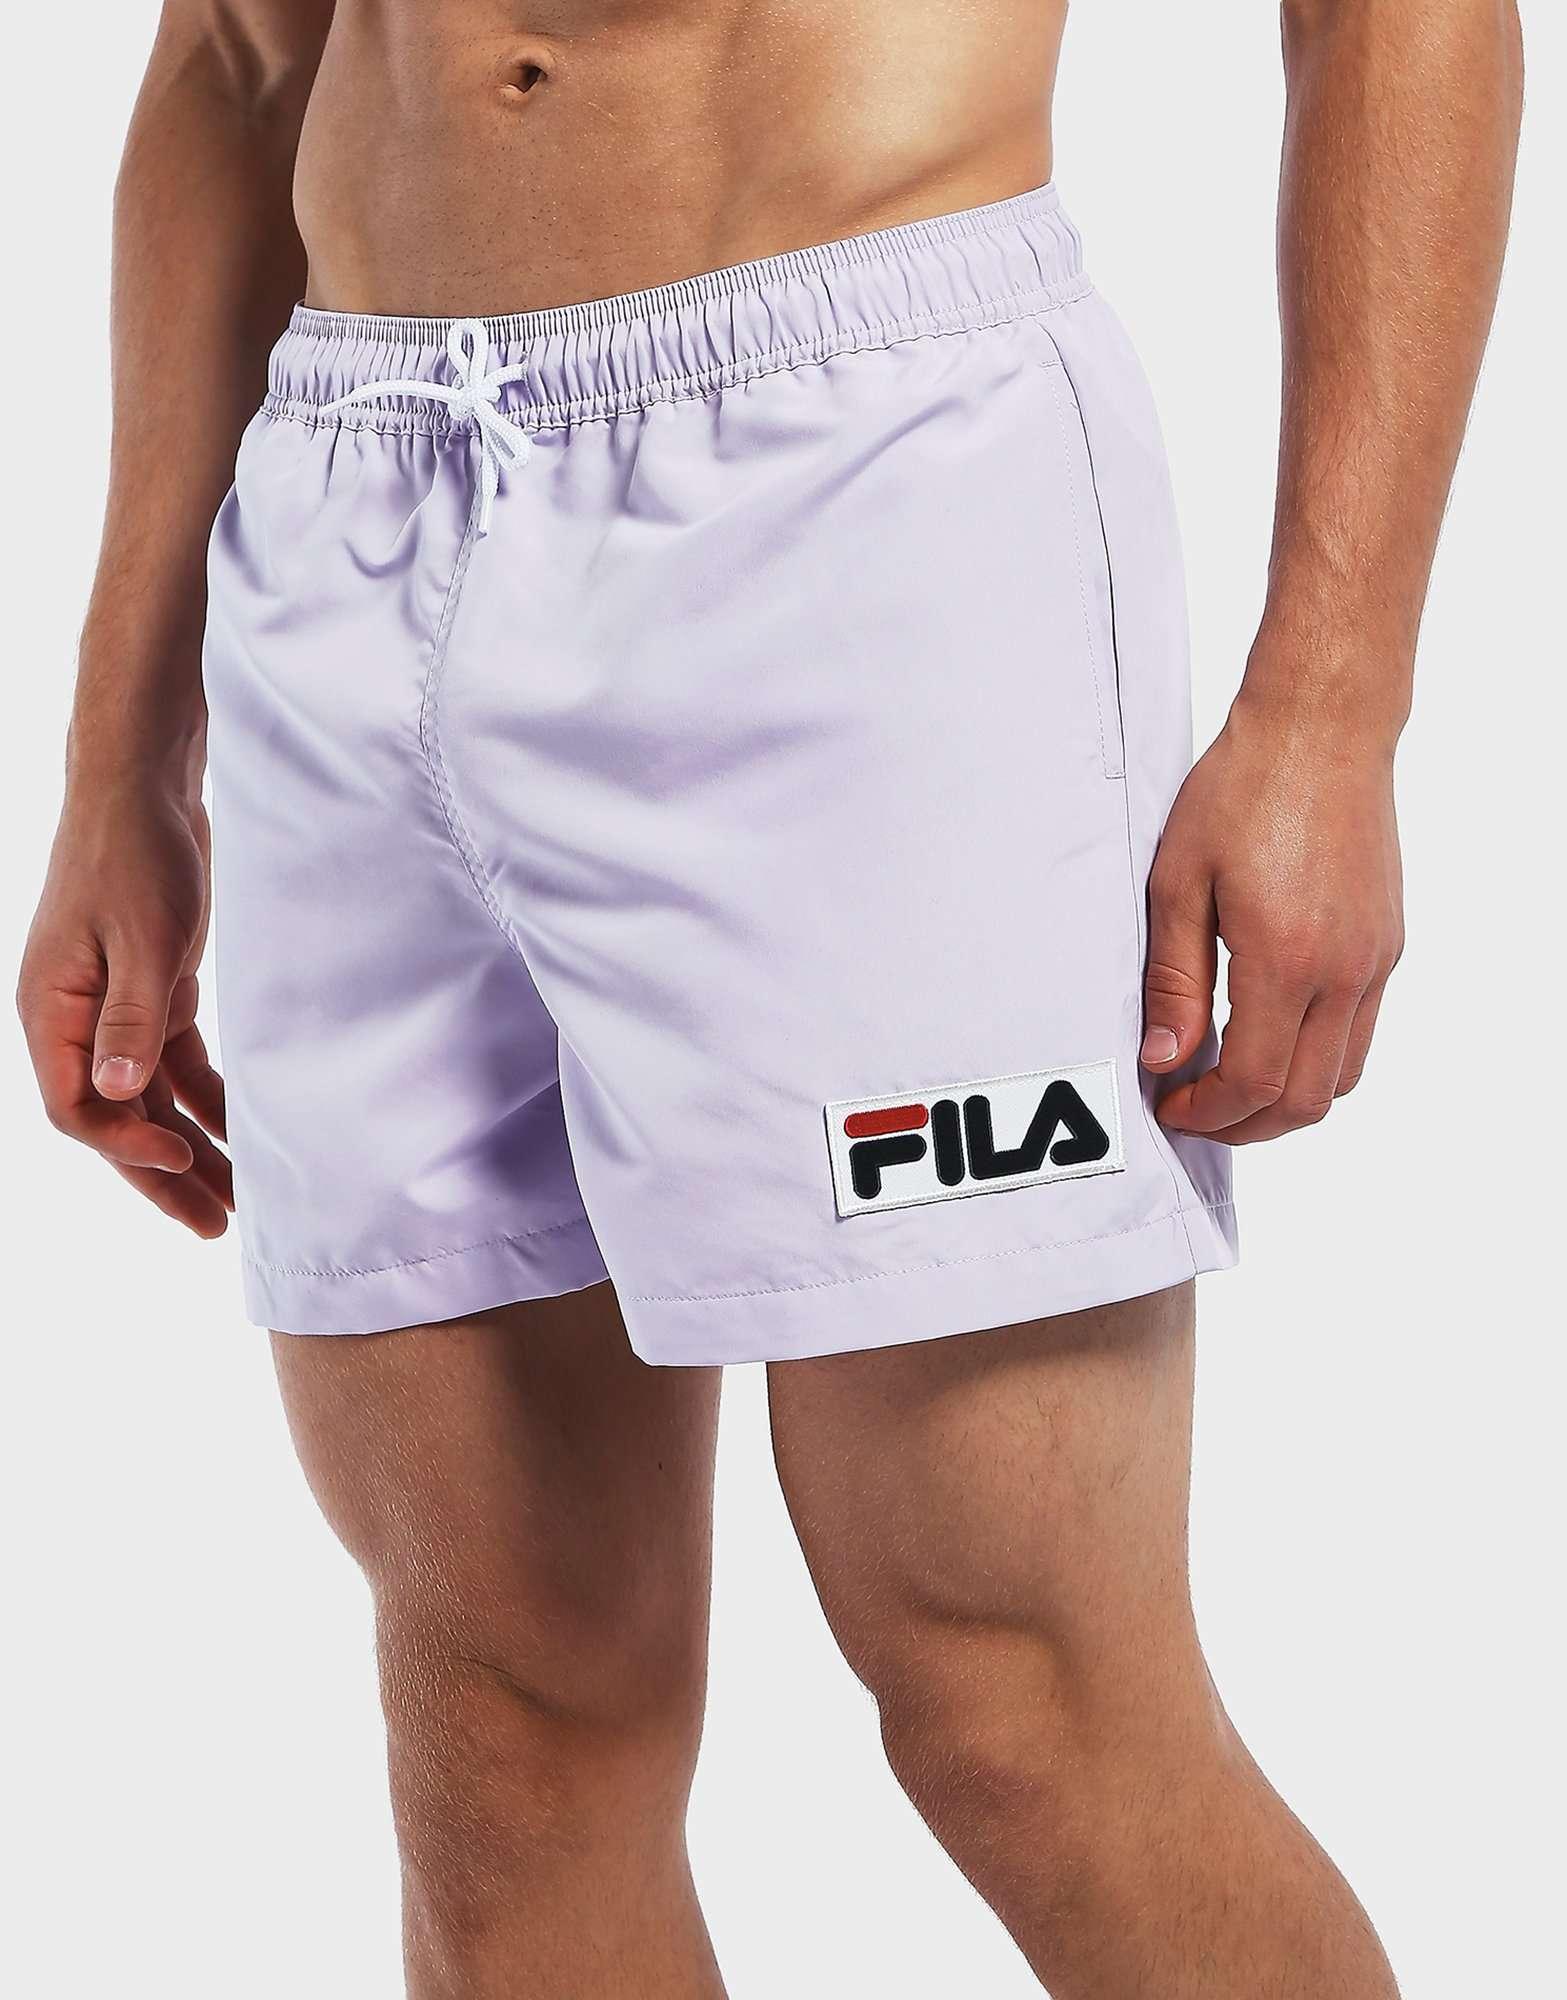 Fila Testa Swim Shorts - Exclusive